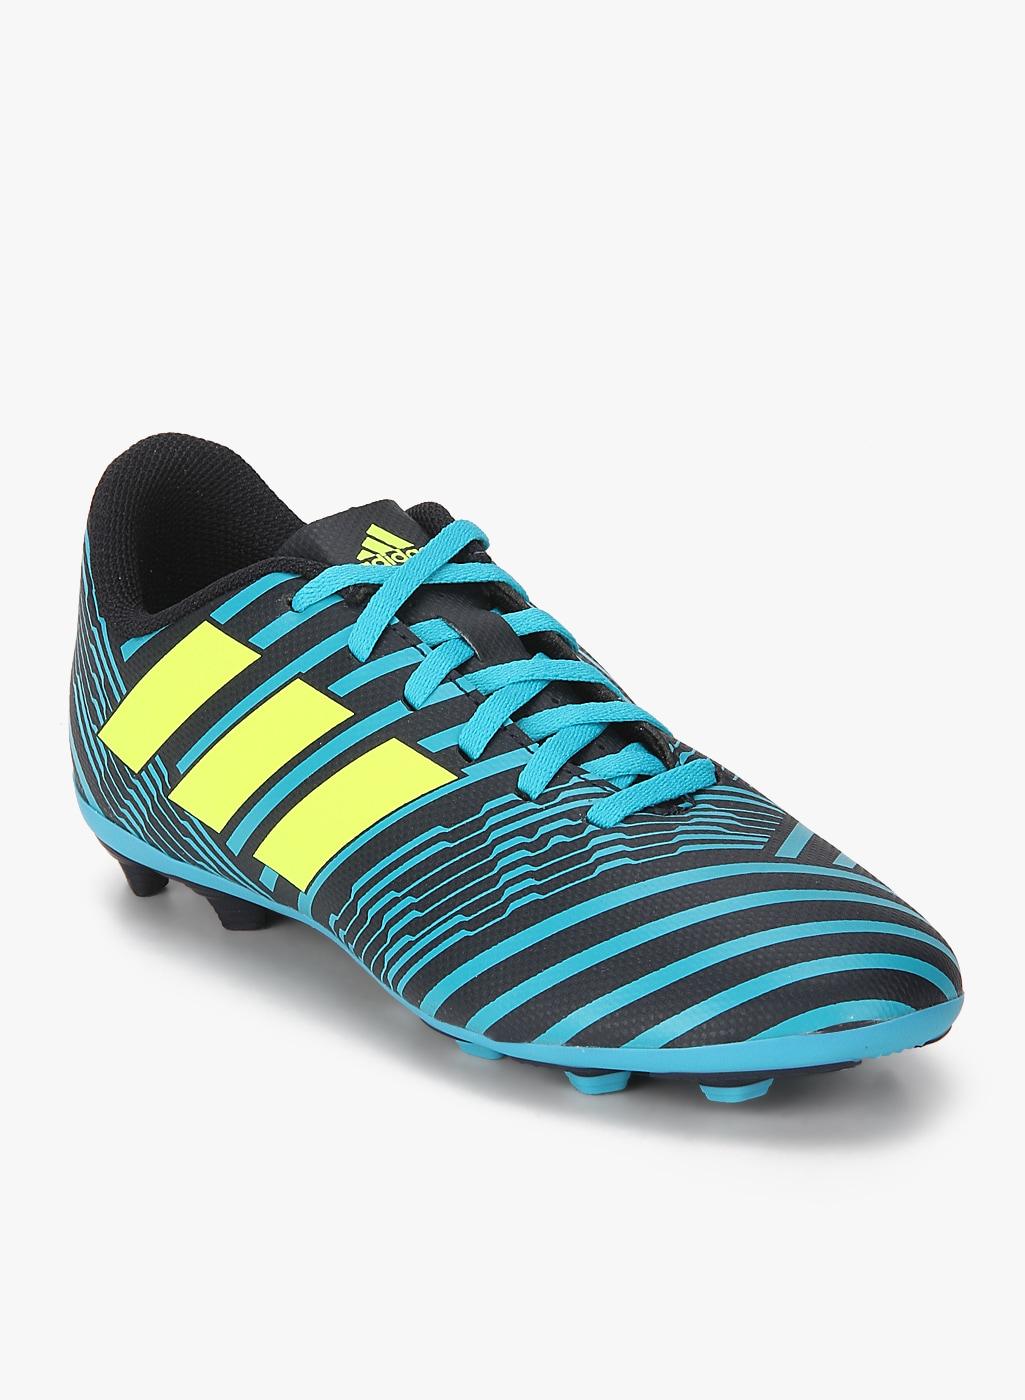 0536db2a470 Adidas Nemeziz 17.4 Fxg Navy Blue Football Shoes for Boys in India ...